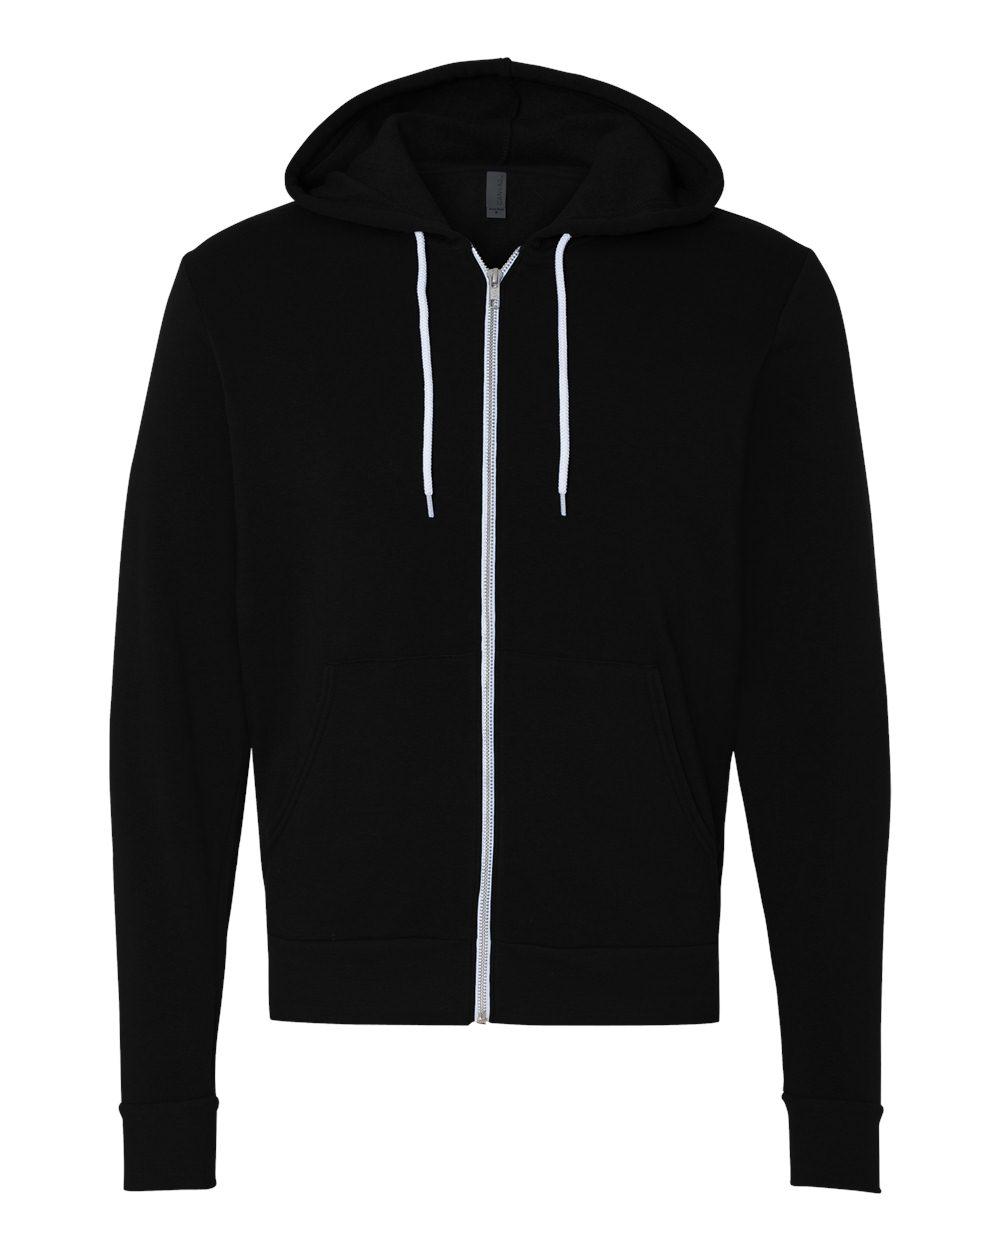 Bella-Canvas-Unisex-Full-Zip-Up-Hooded-Sweatshirt-Blank-Hoodie-3739-up-to-3XL thumbnail 11